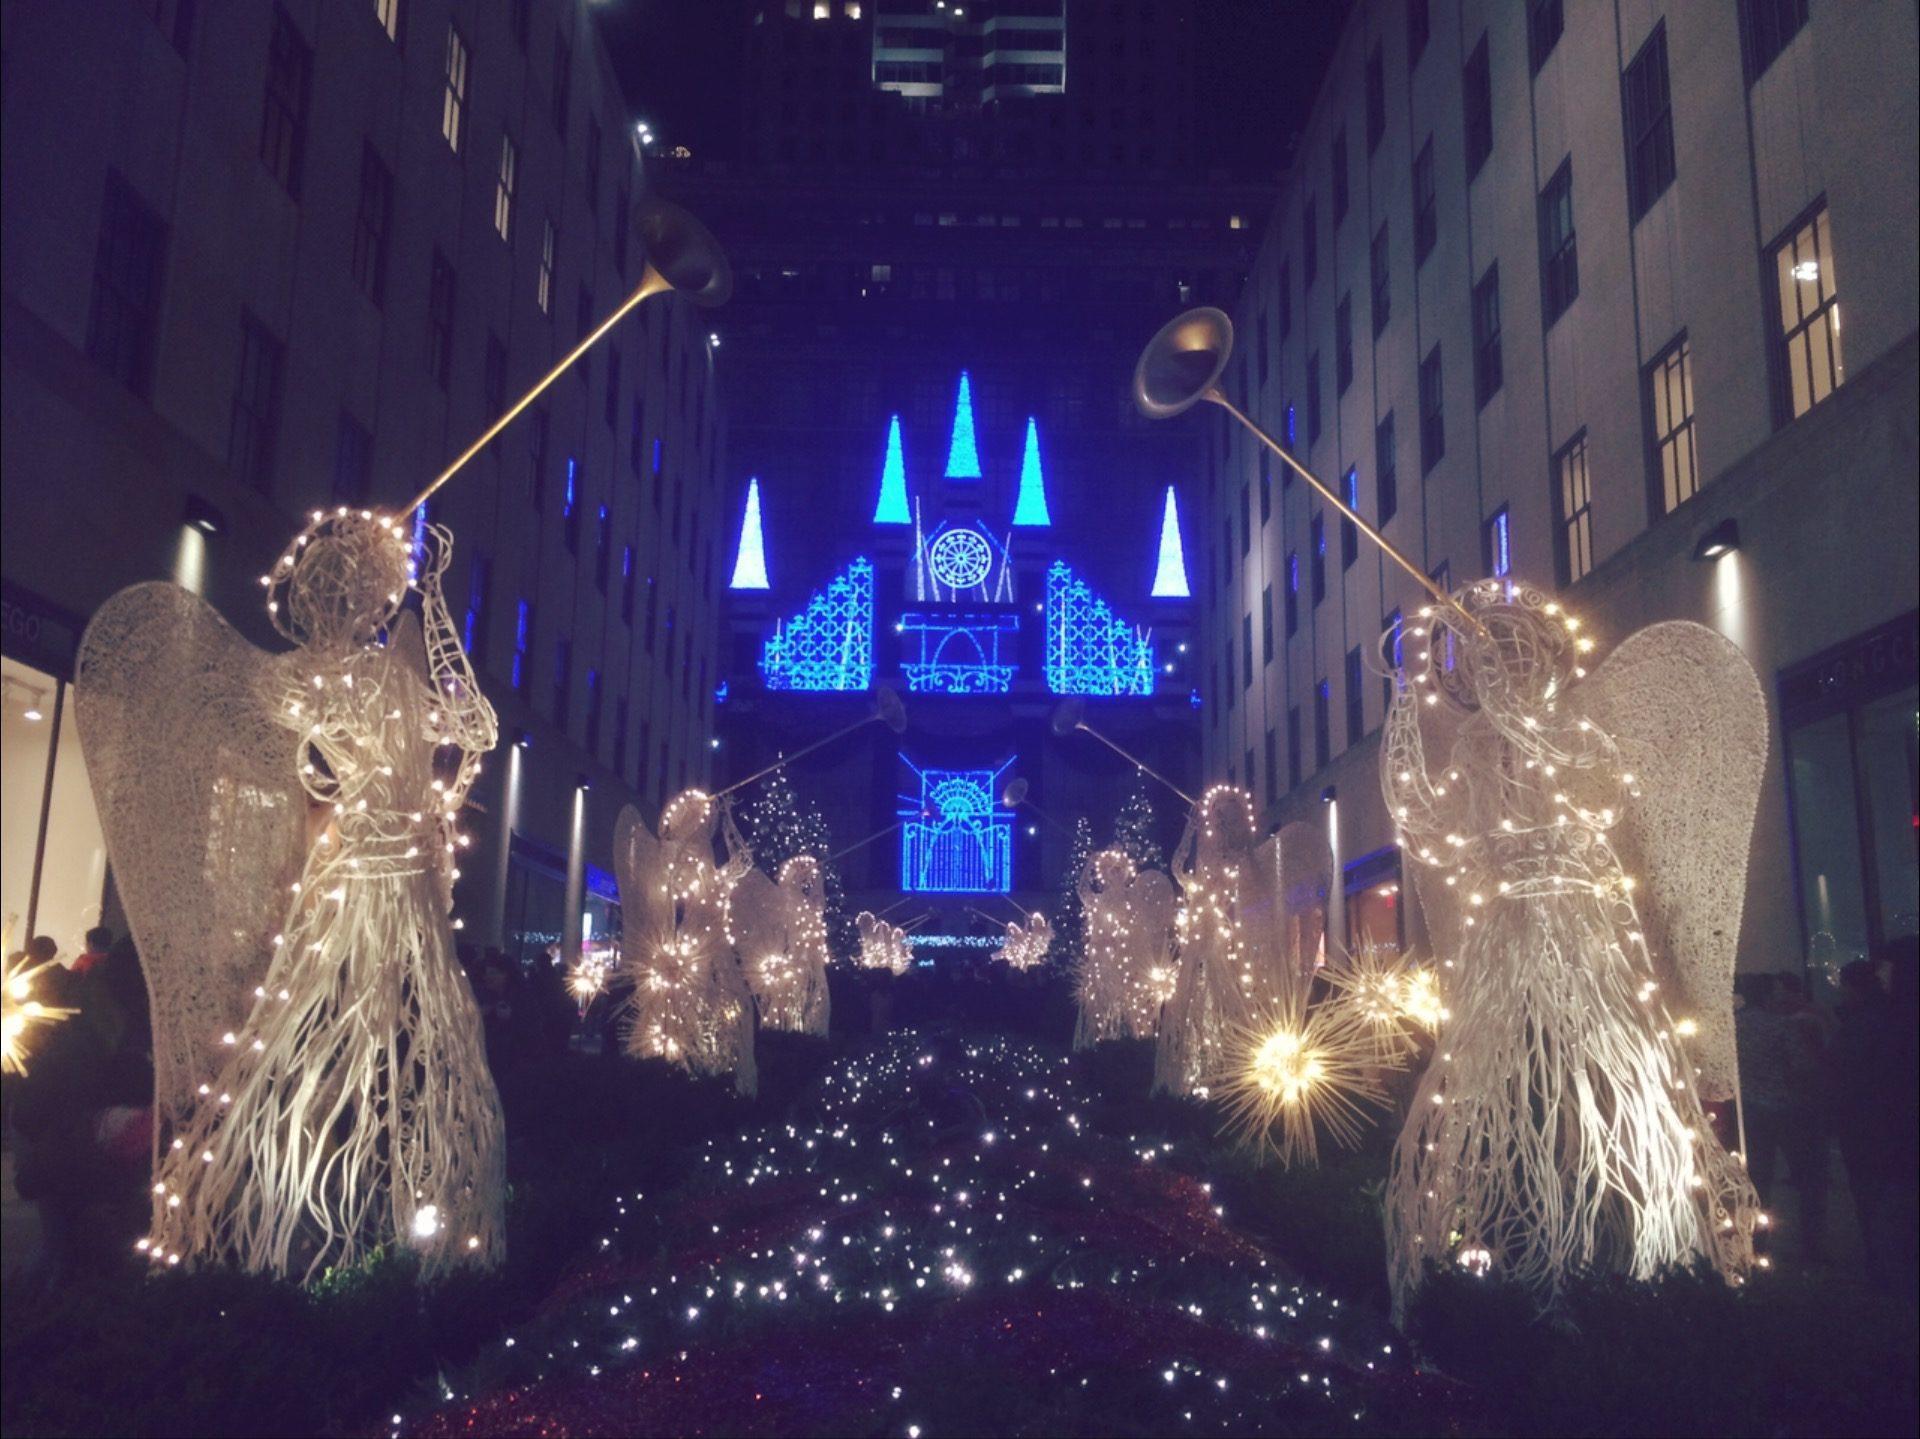 rockfellercenter_christmas-season-newyork